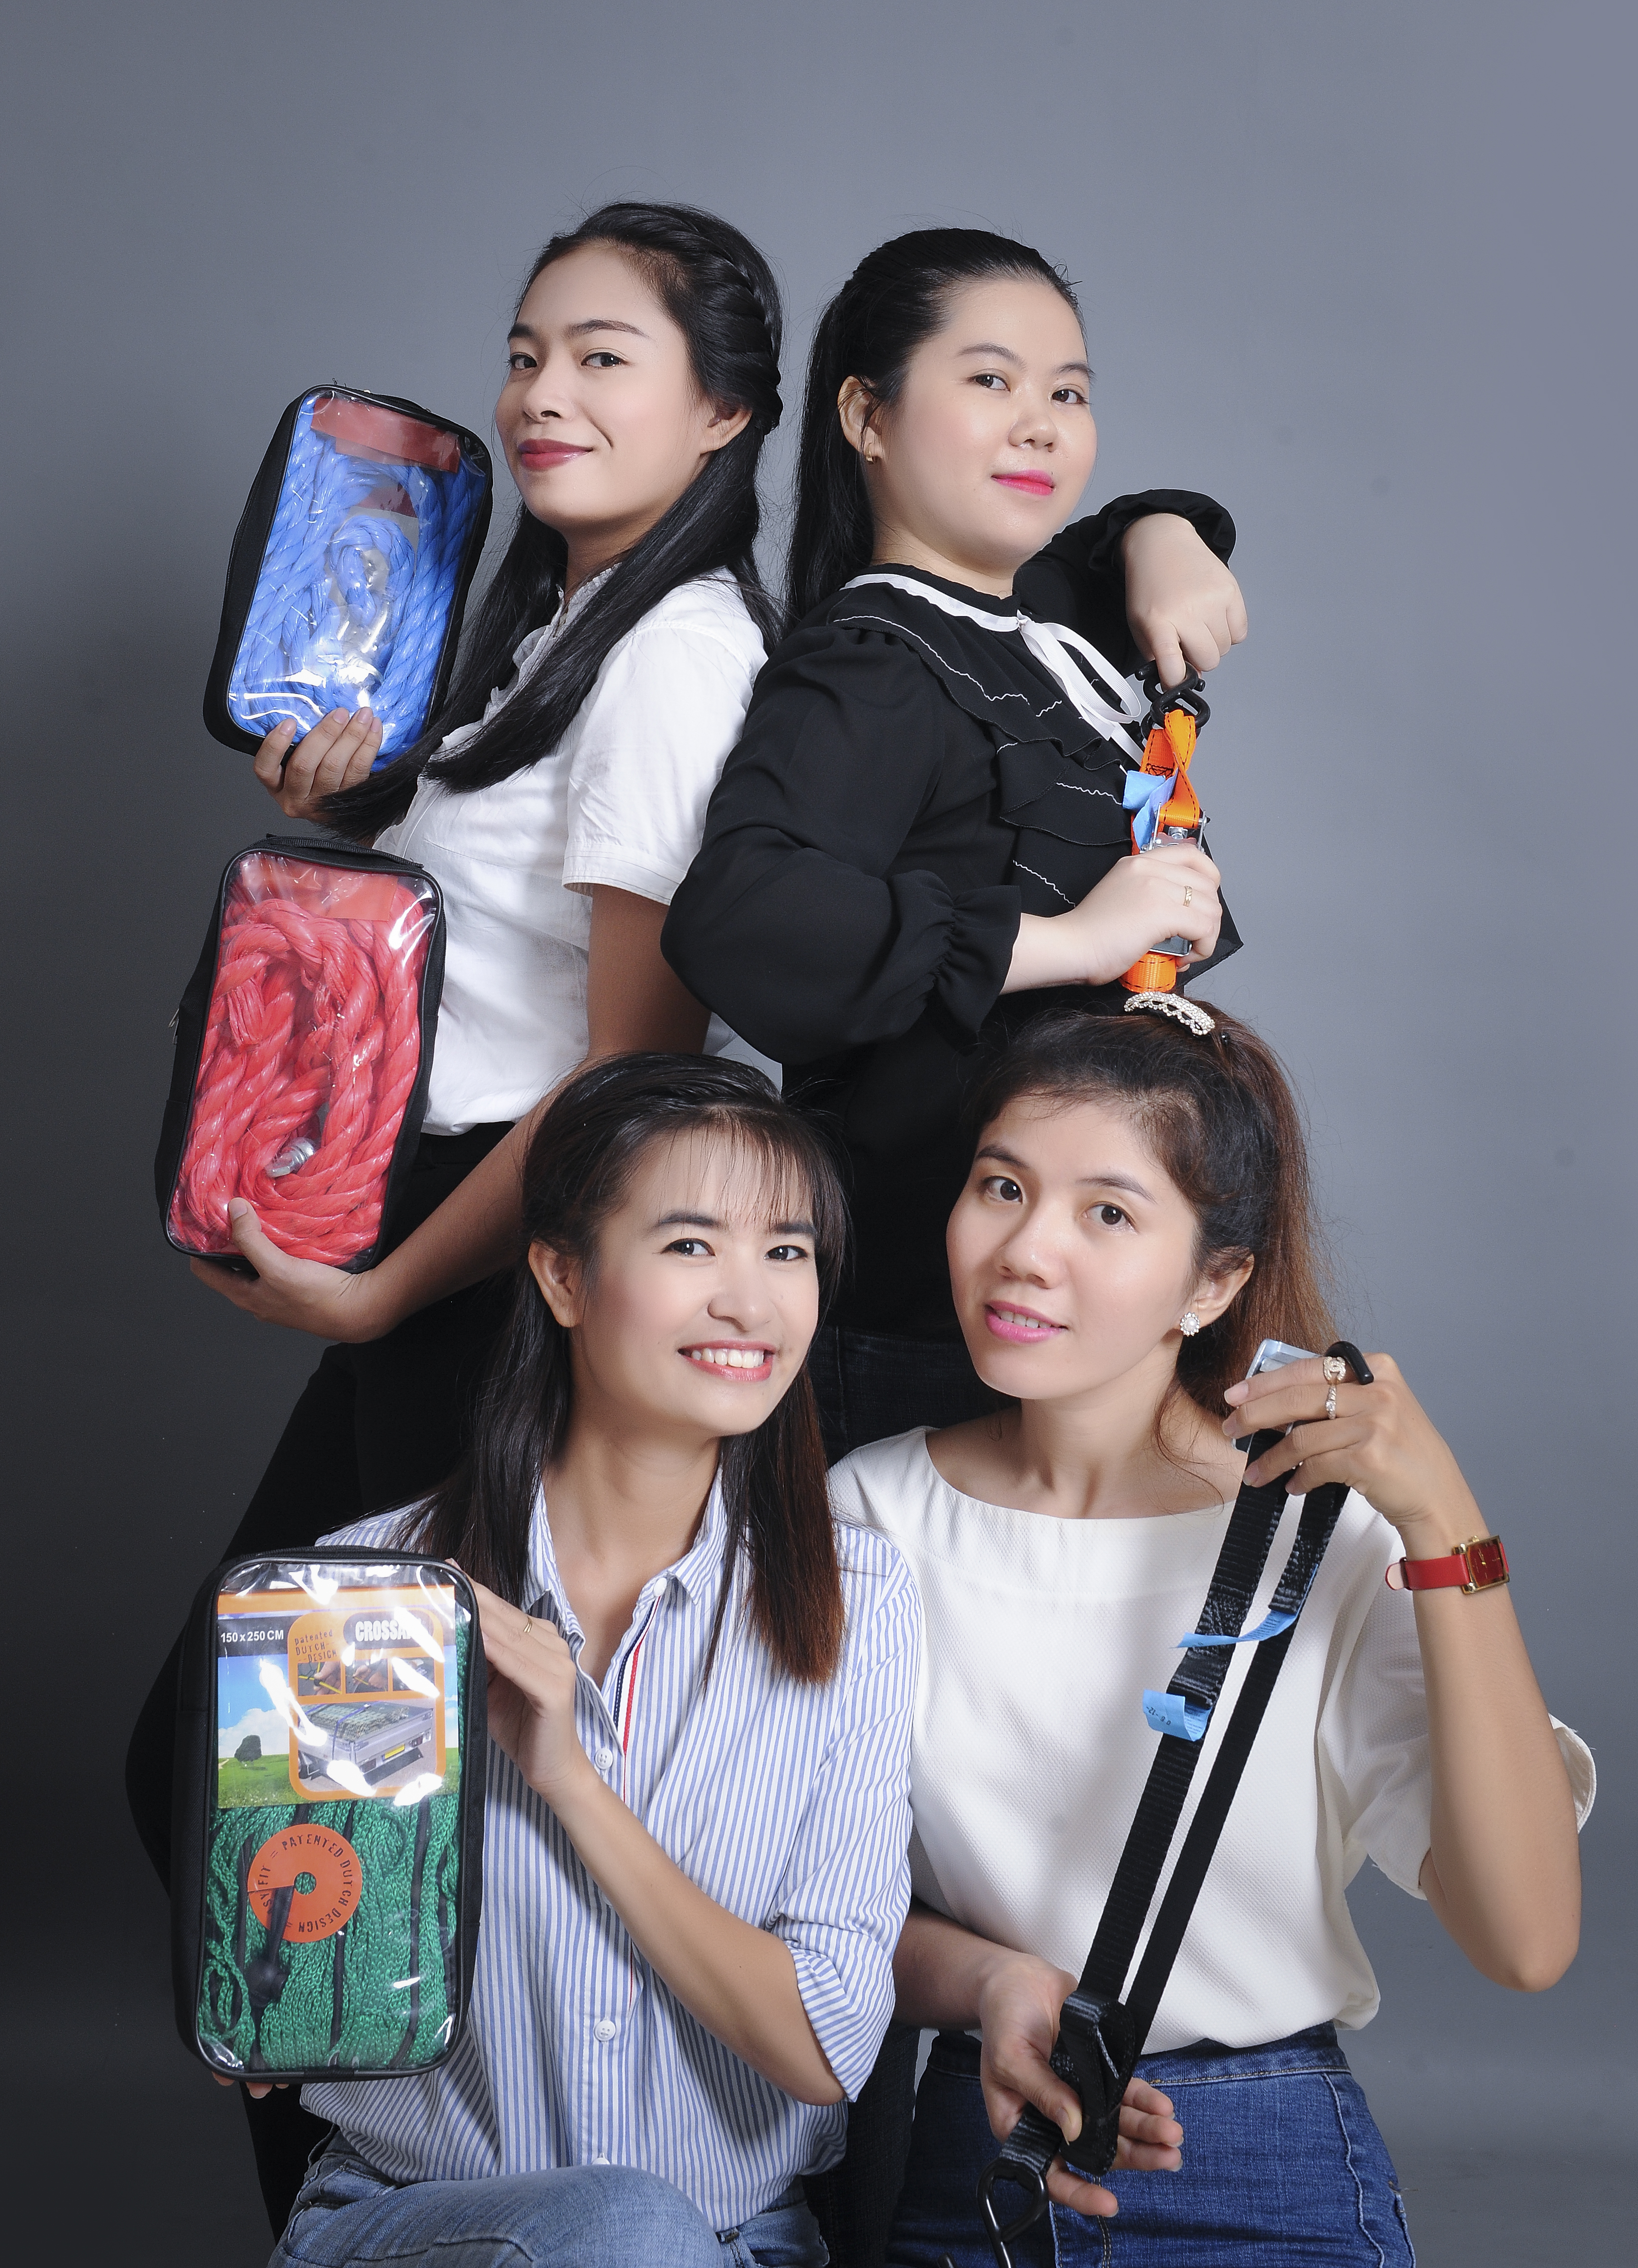 Ms. Thoa Tran